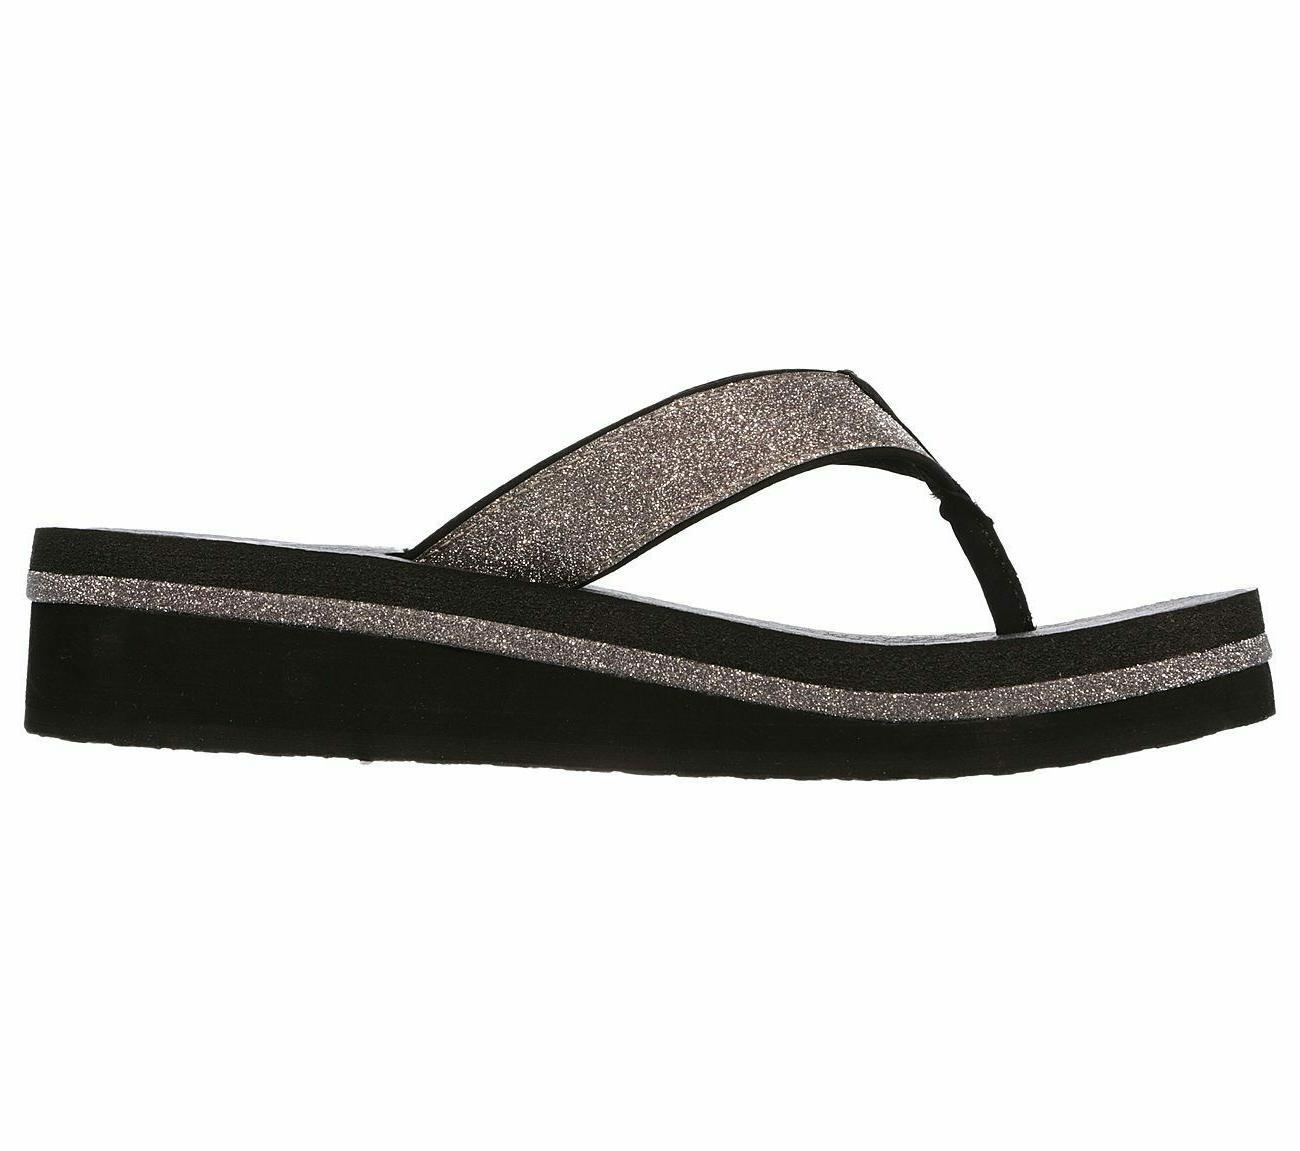 Skechers Micro Glitter Sandals Black Silver 9